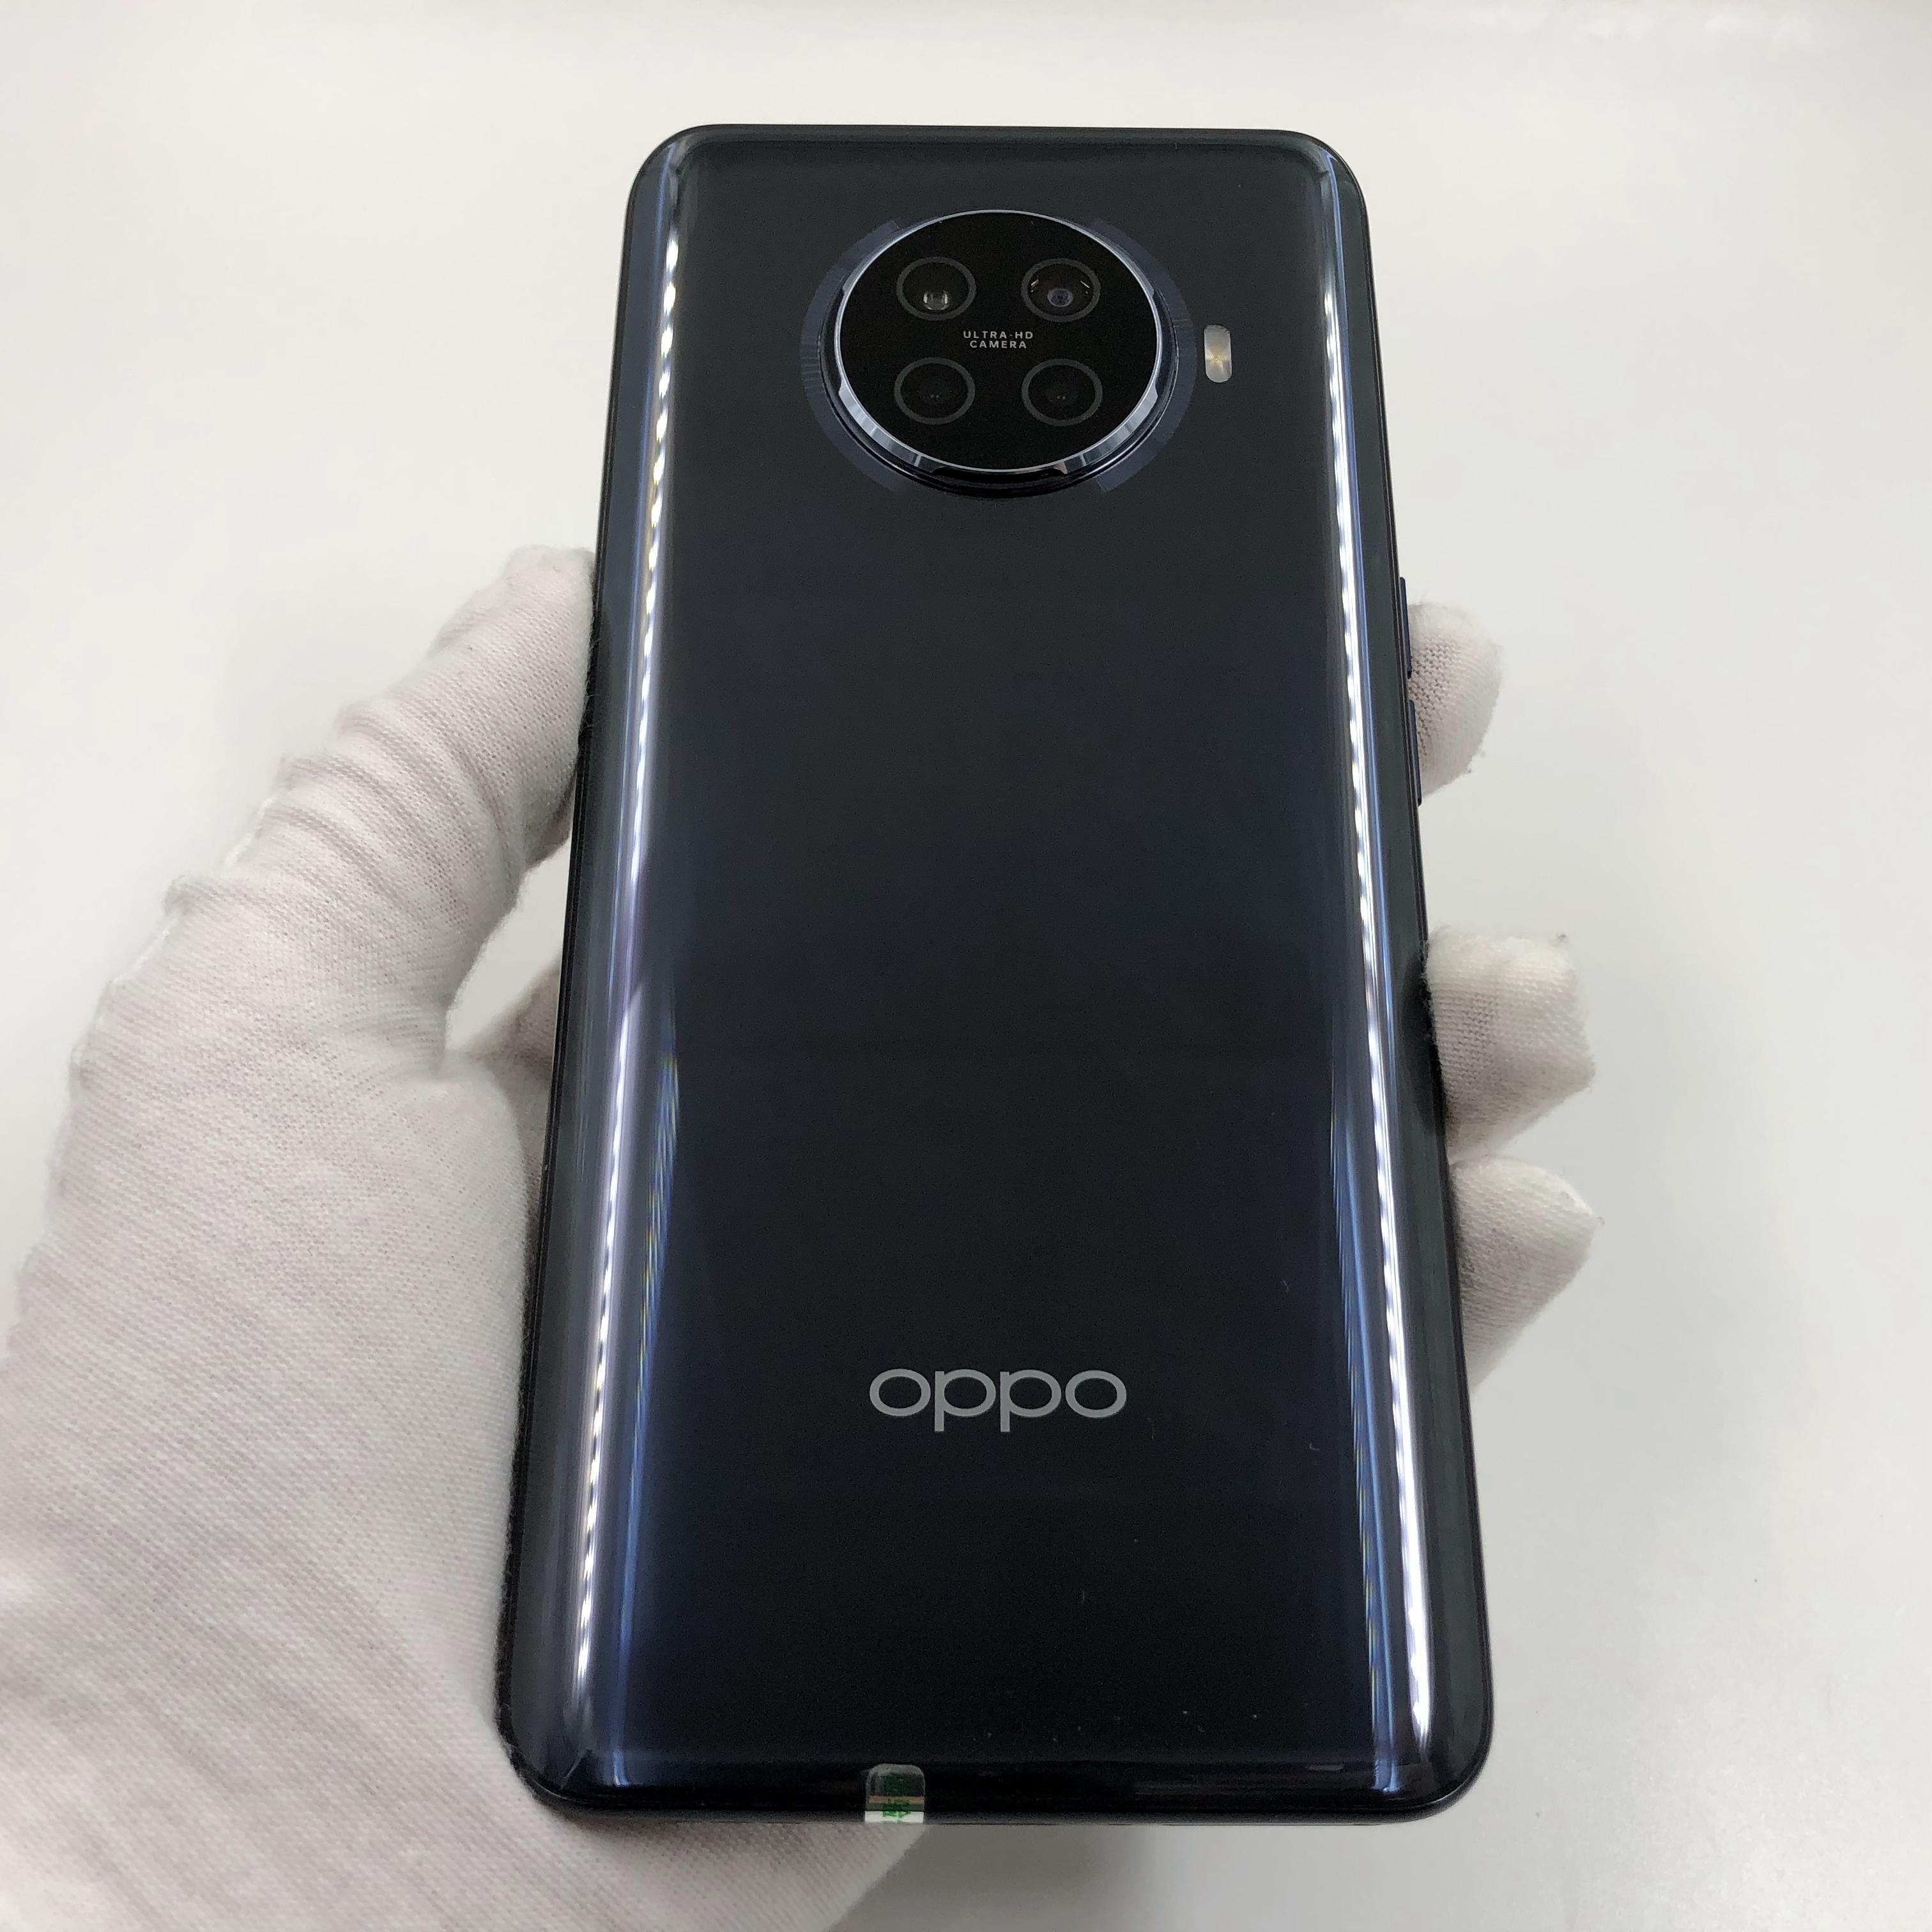 oppo【Ace2 5G】5G全网通 月岩灰 8G/256G 国行 95新 真机实拍